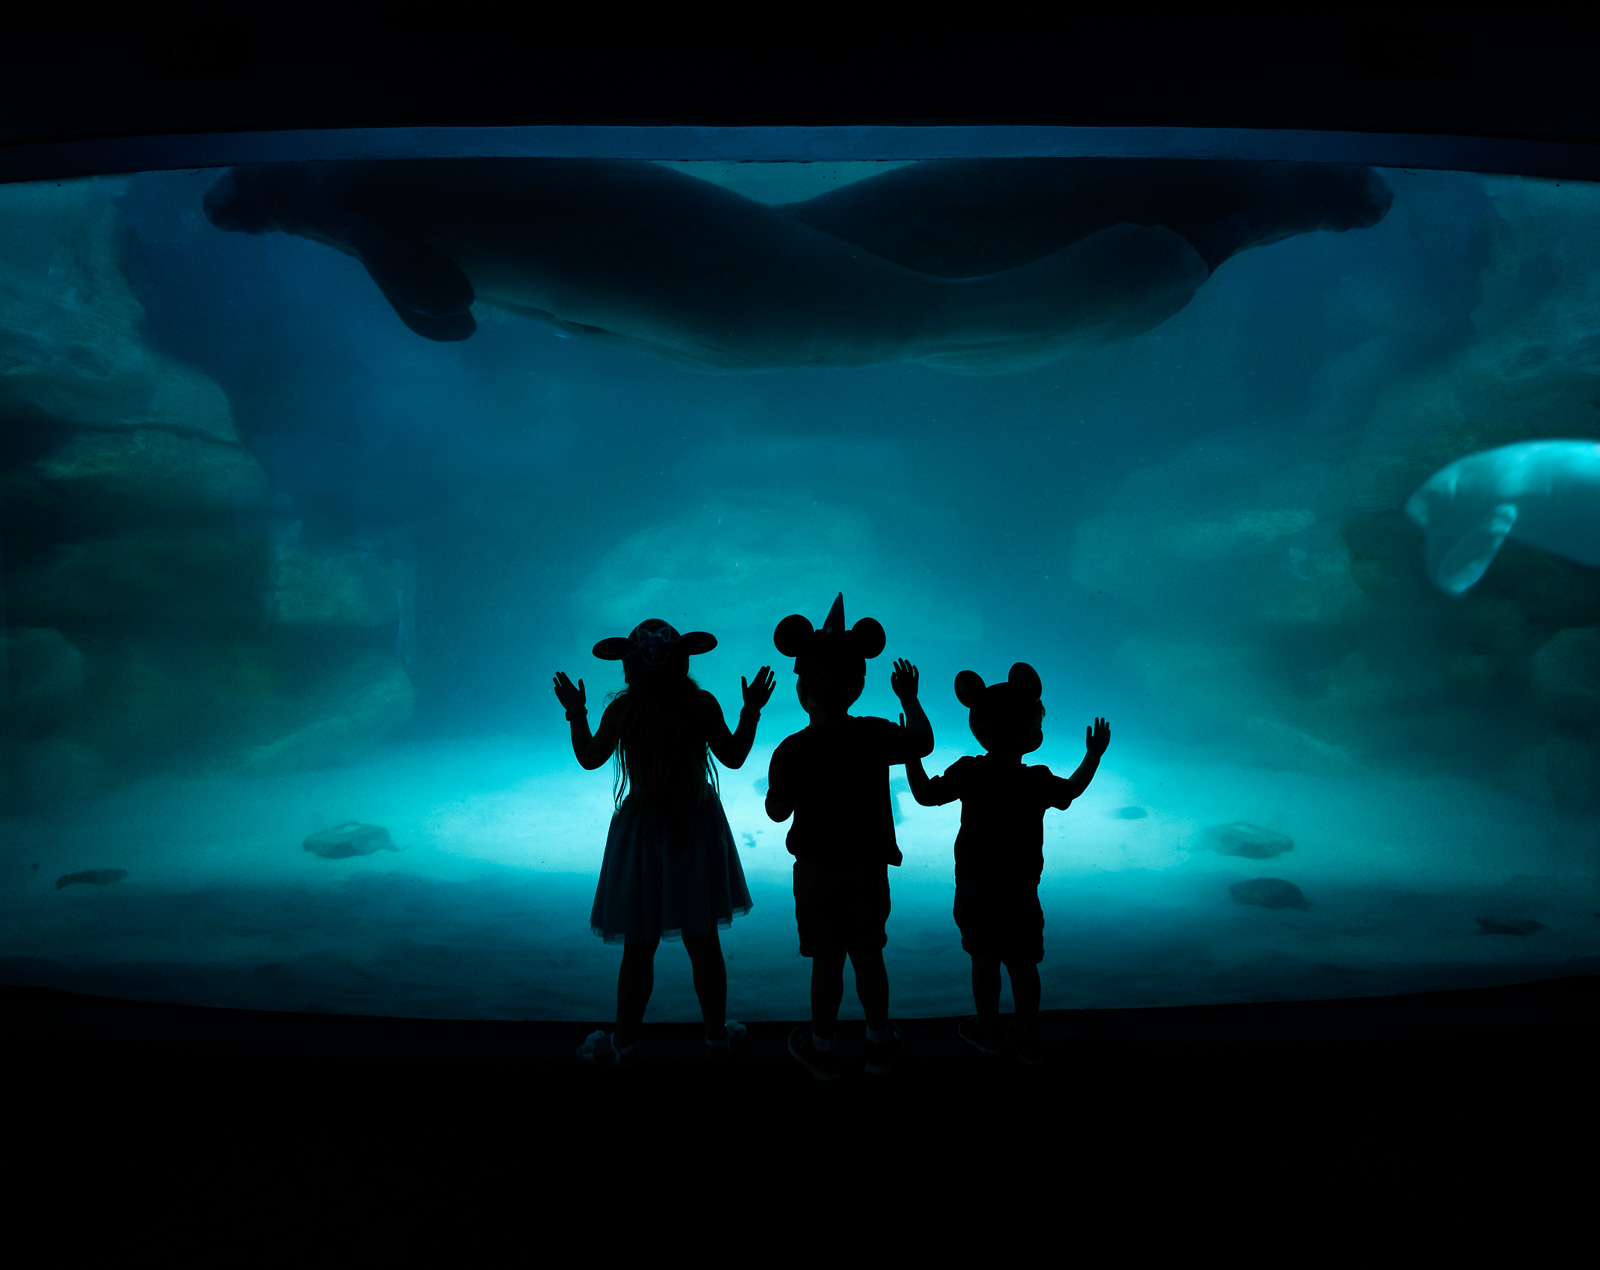 24 Disney photo tips from pro photographers